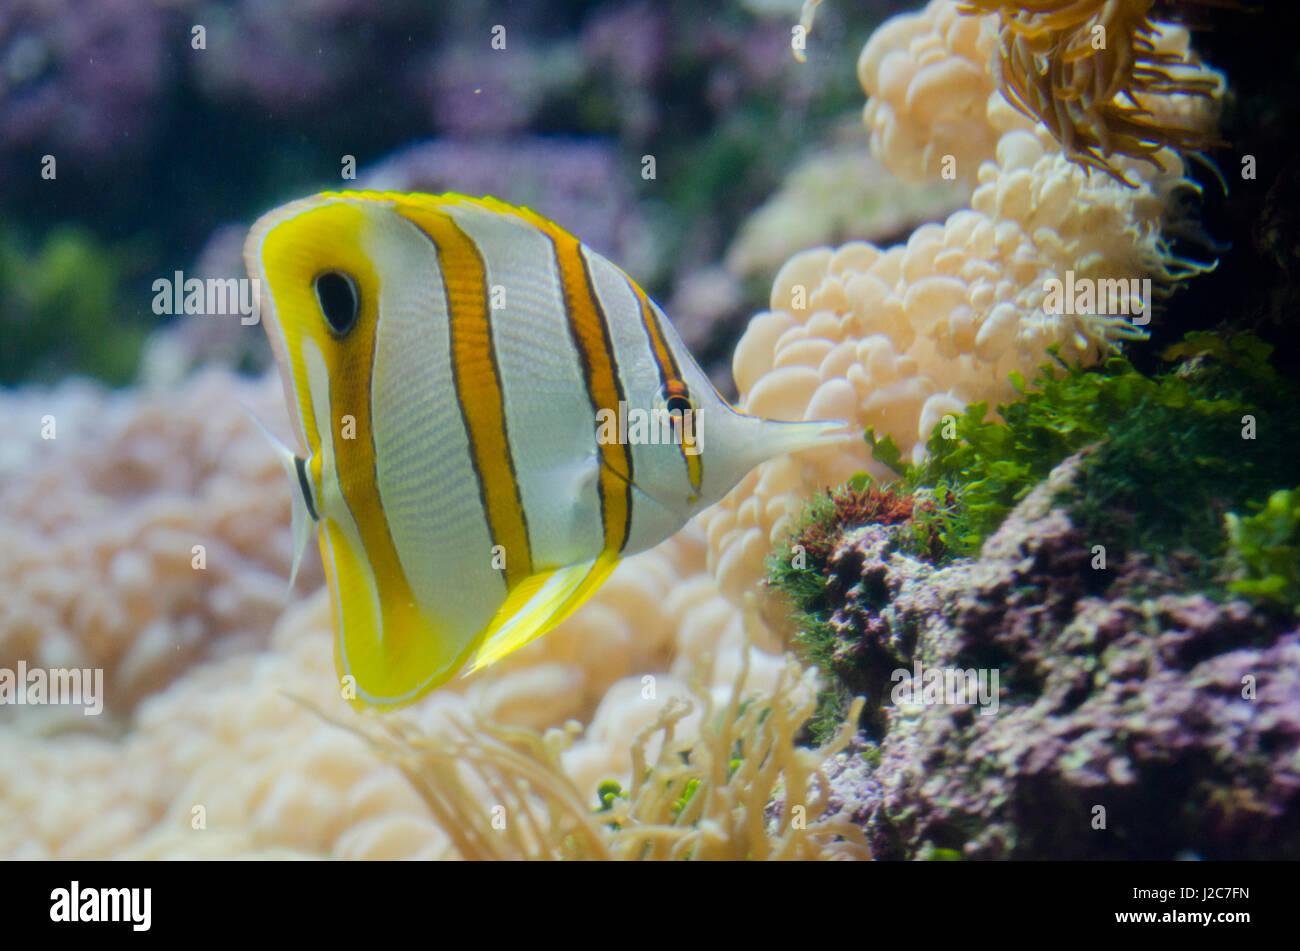 Australia, Sydney. Sydney Sea Life Aquarium. Copperband butterflyfish (Chelmon rostratus) - Stock Image